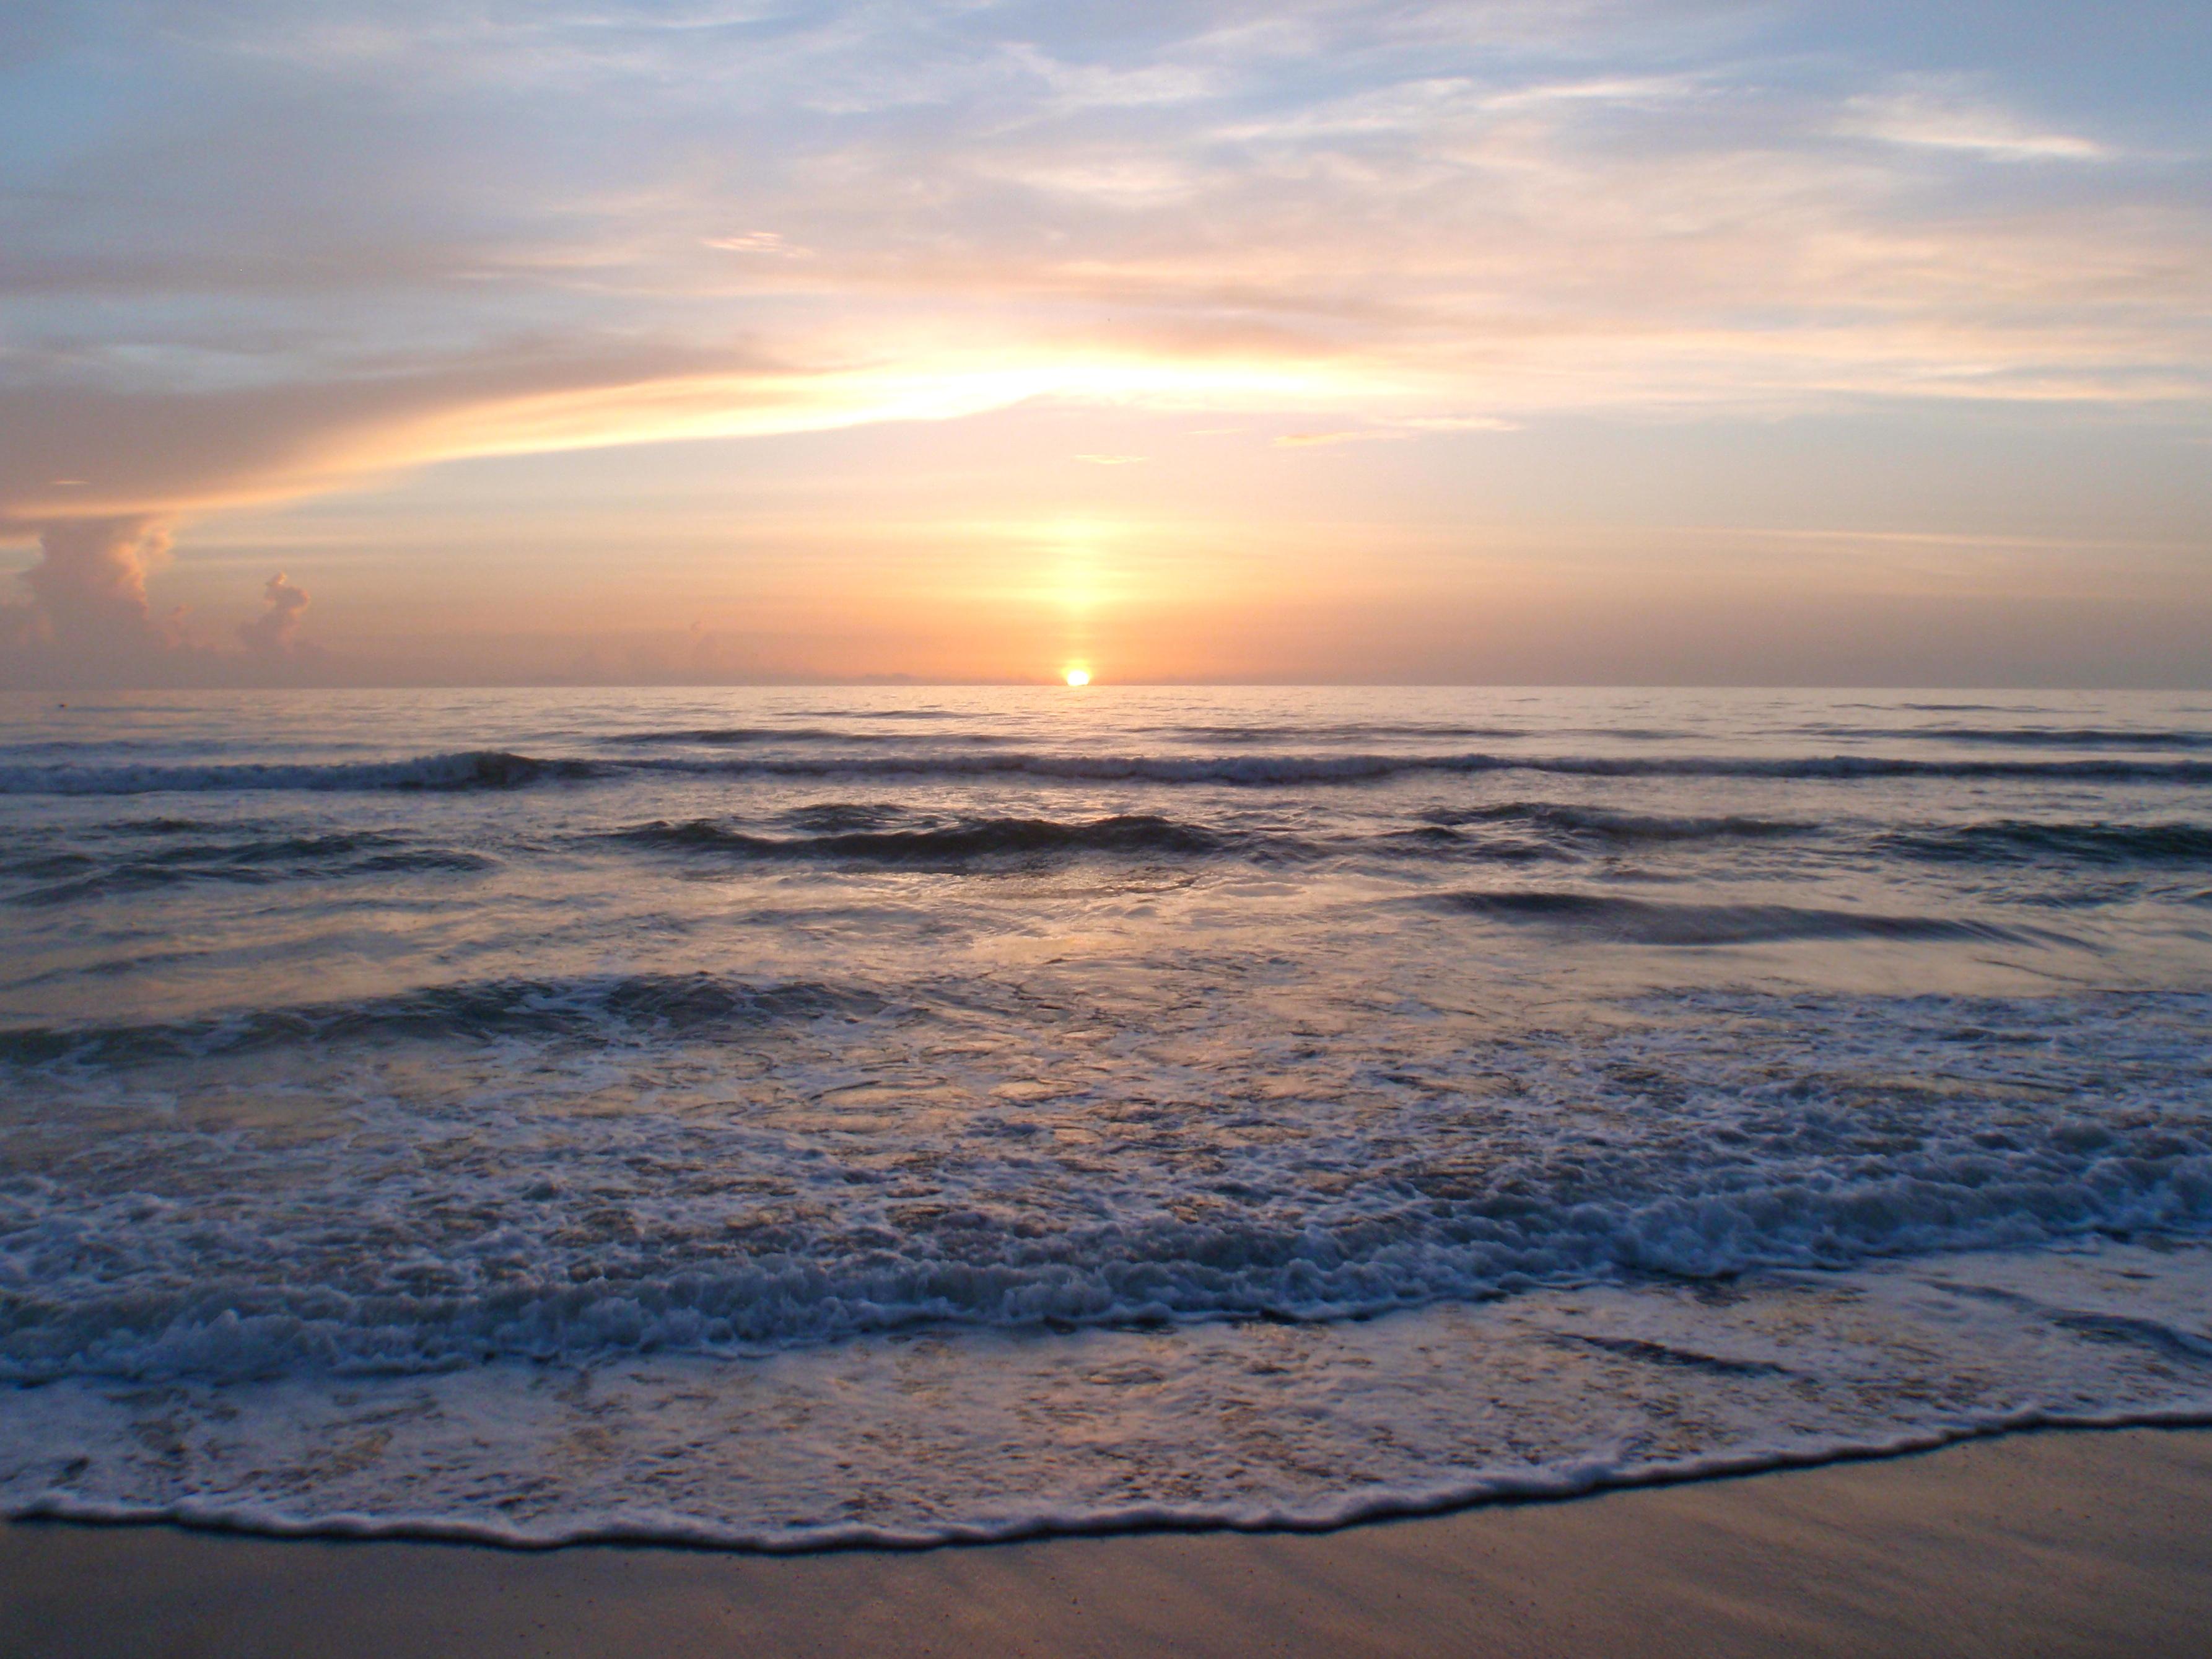 Sunrise Over Melbourne Beach, Florida | Melbourne Beach ...